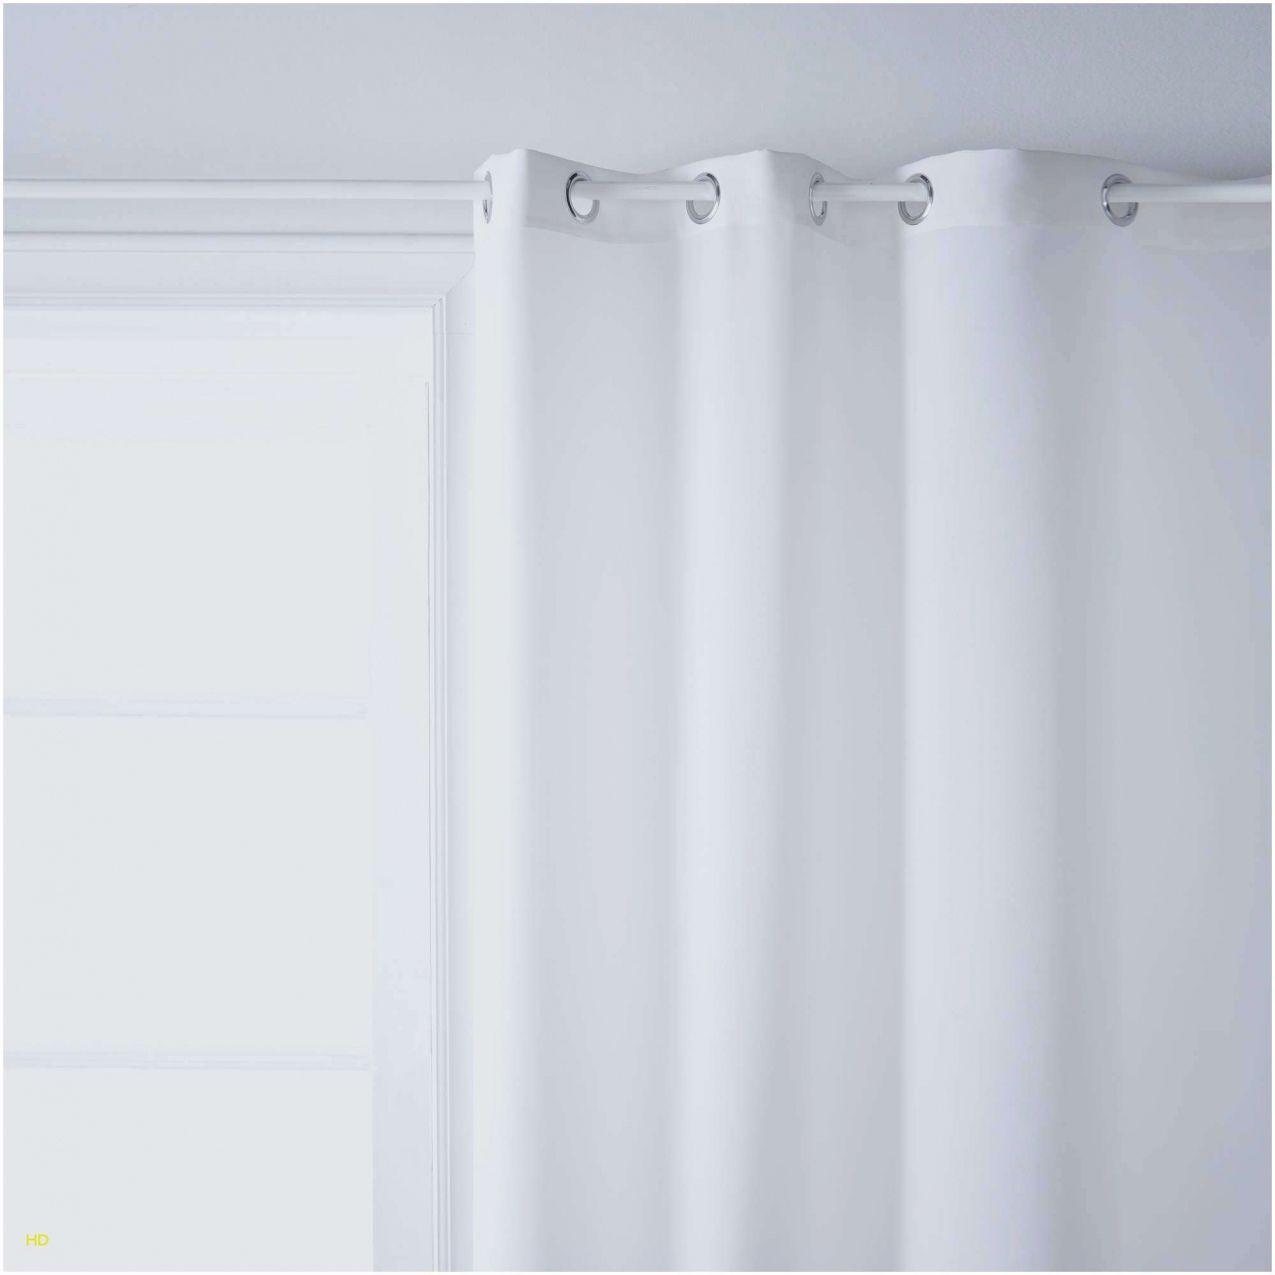 77 Rideau De Porte Bambou Leroy Merlin 2019 Basic Shower Curtain Curtains Shower Curtain